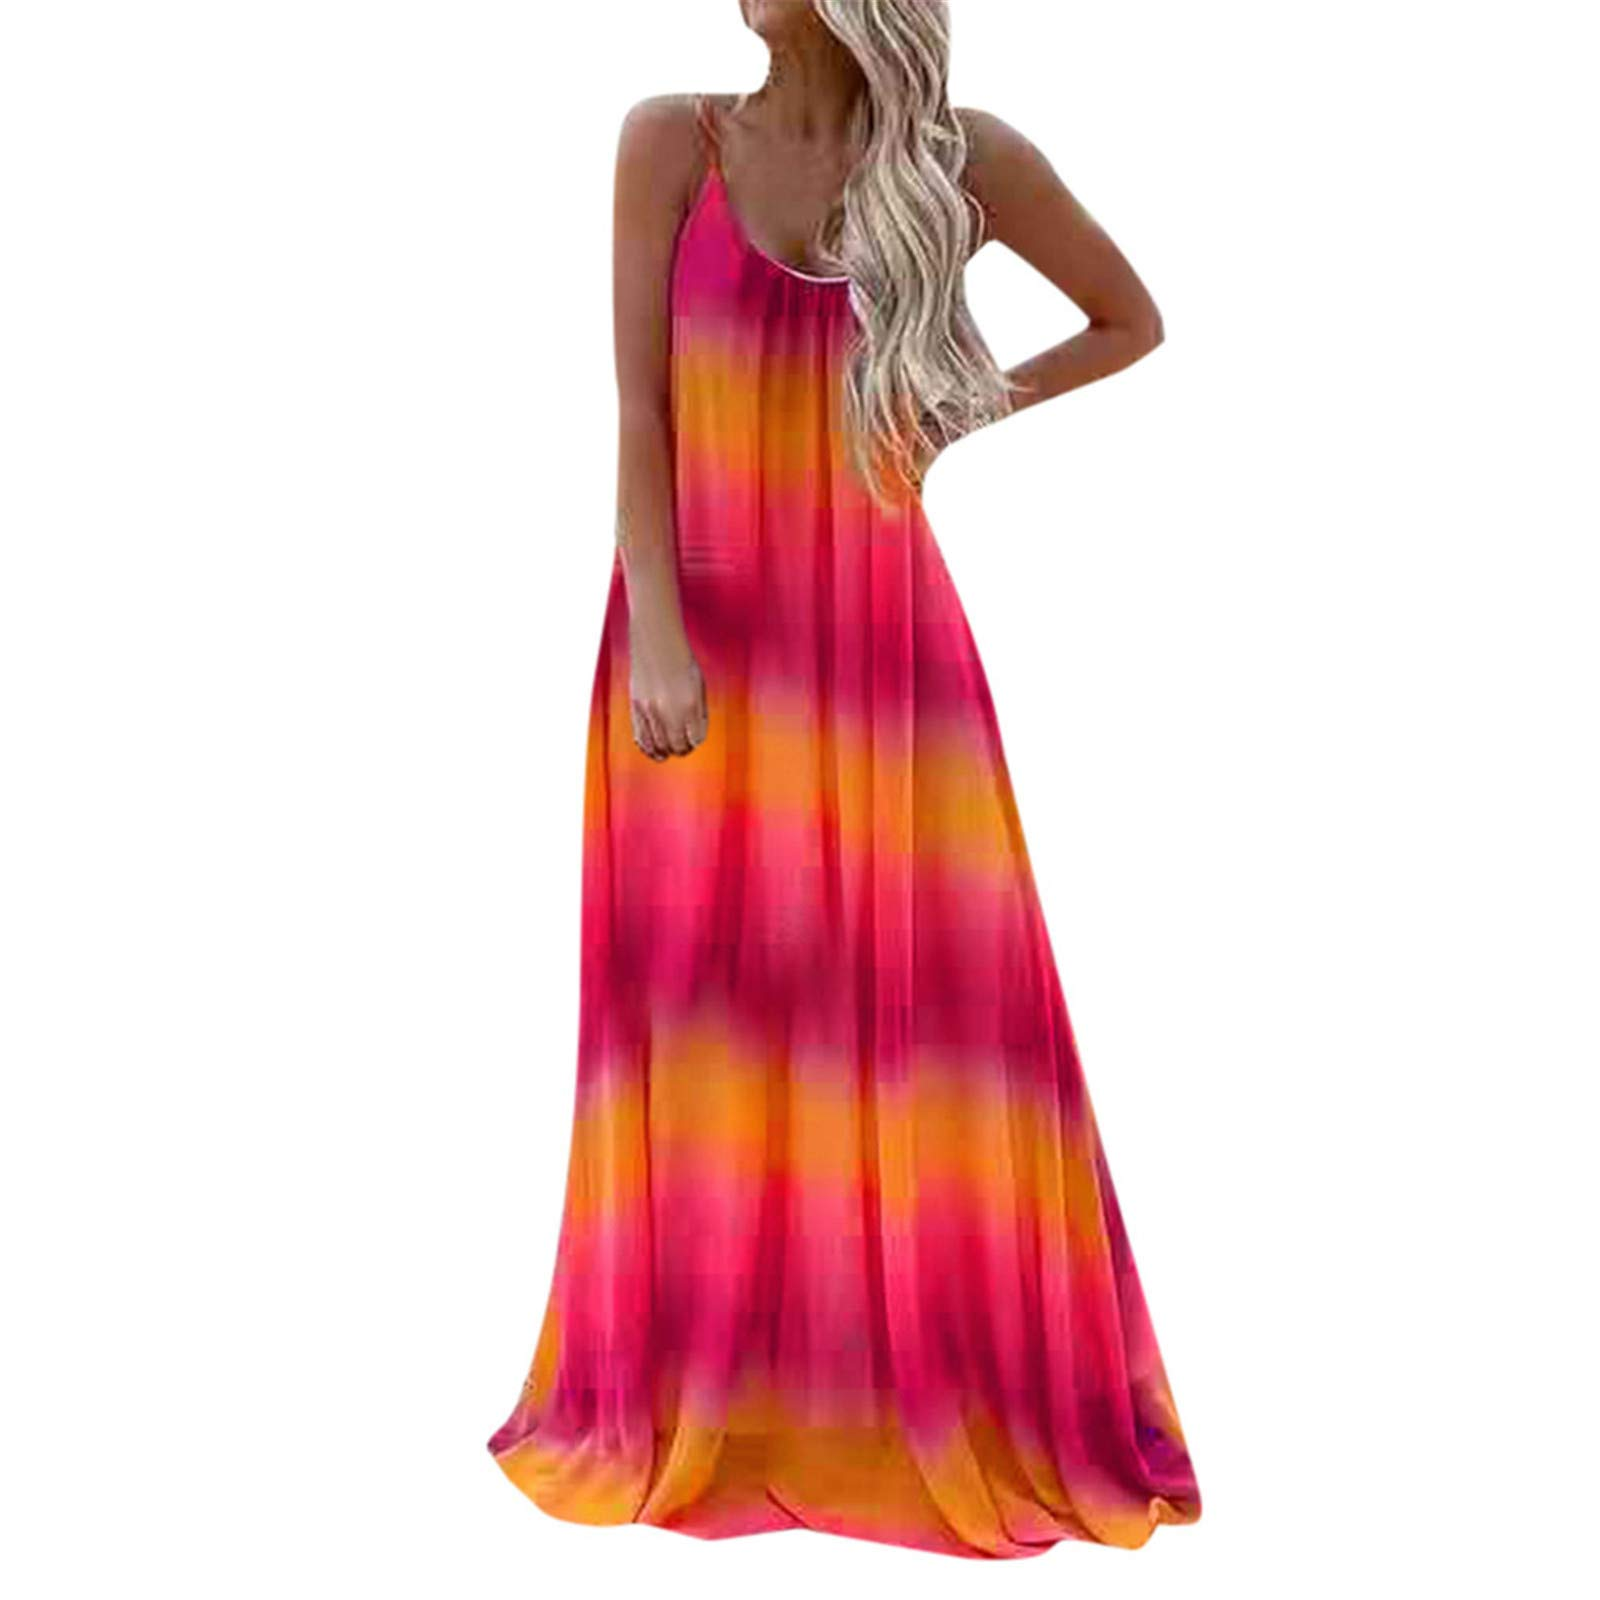 wodceeke Womens Summer Long Maxi Dress Boho Print O-Neck Casual Beach Party Sundress(Red,S) by wodceeke